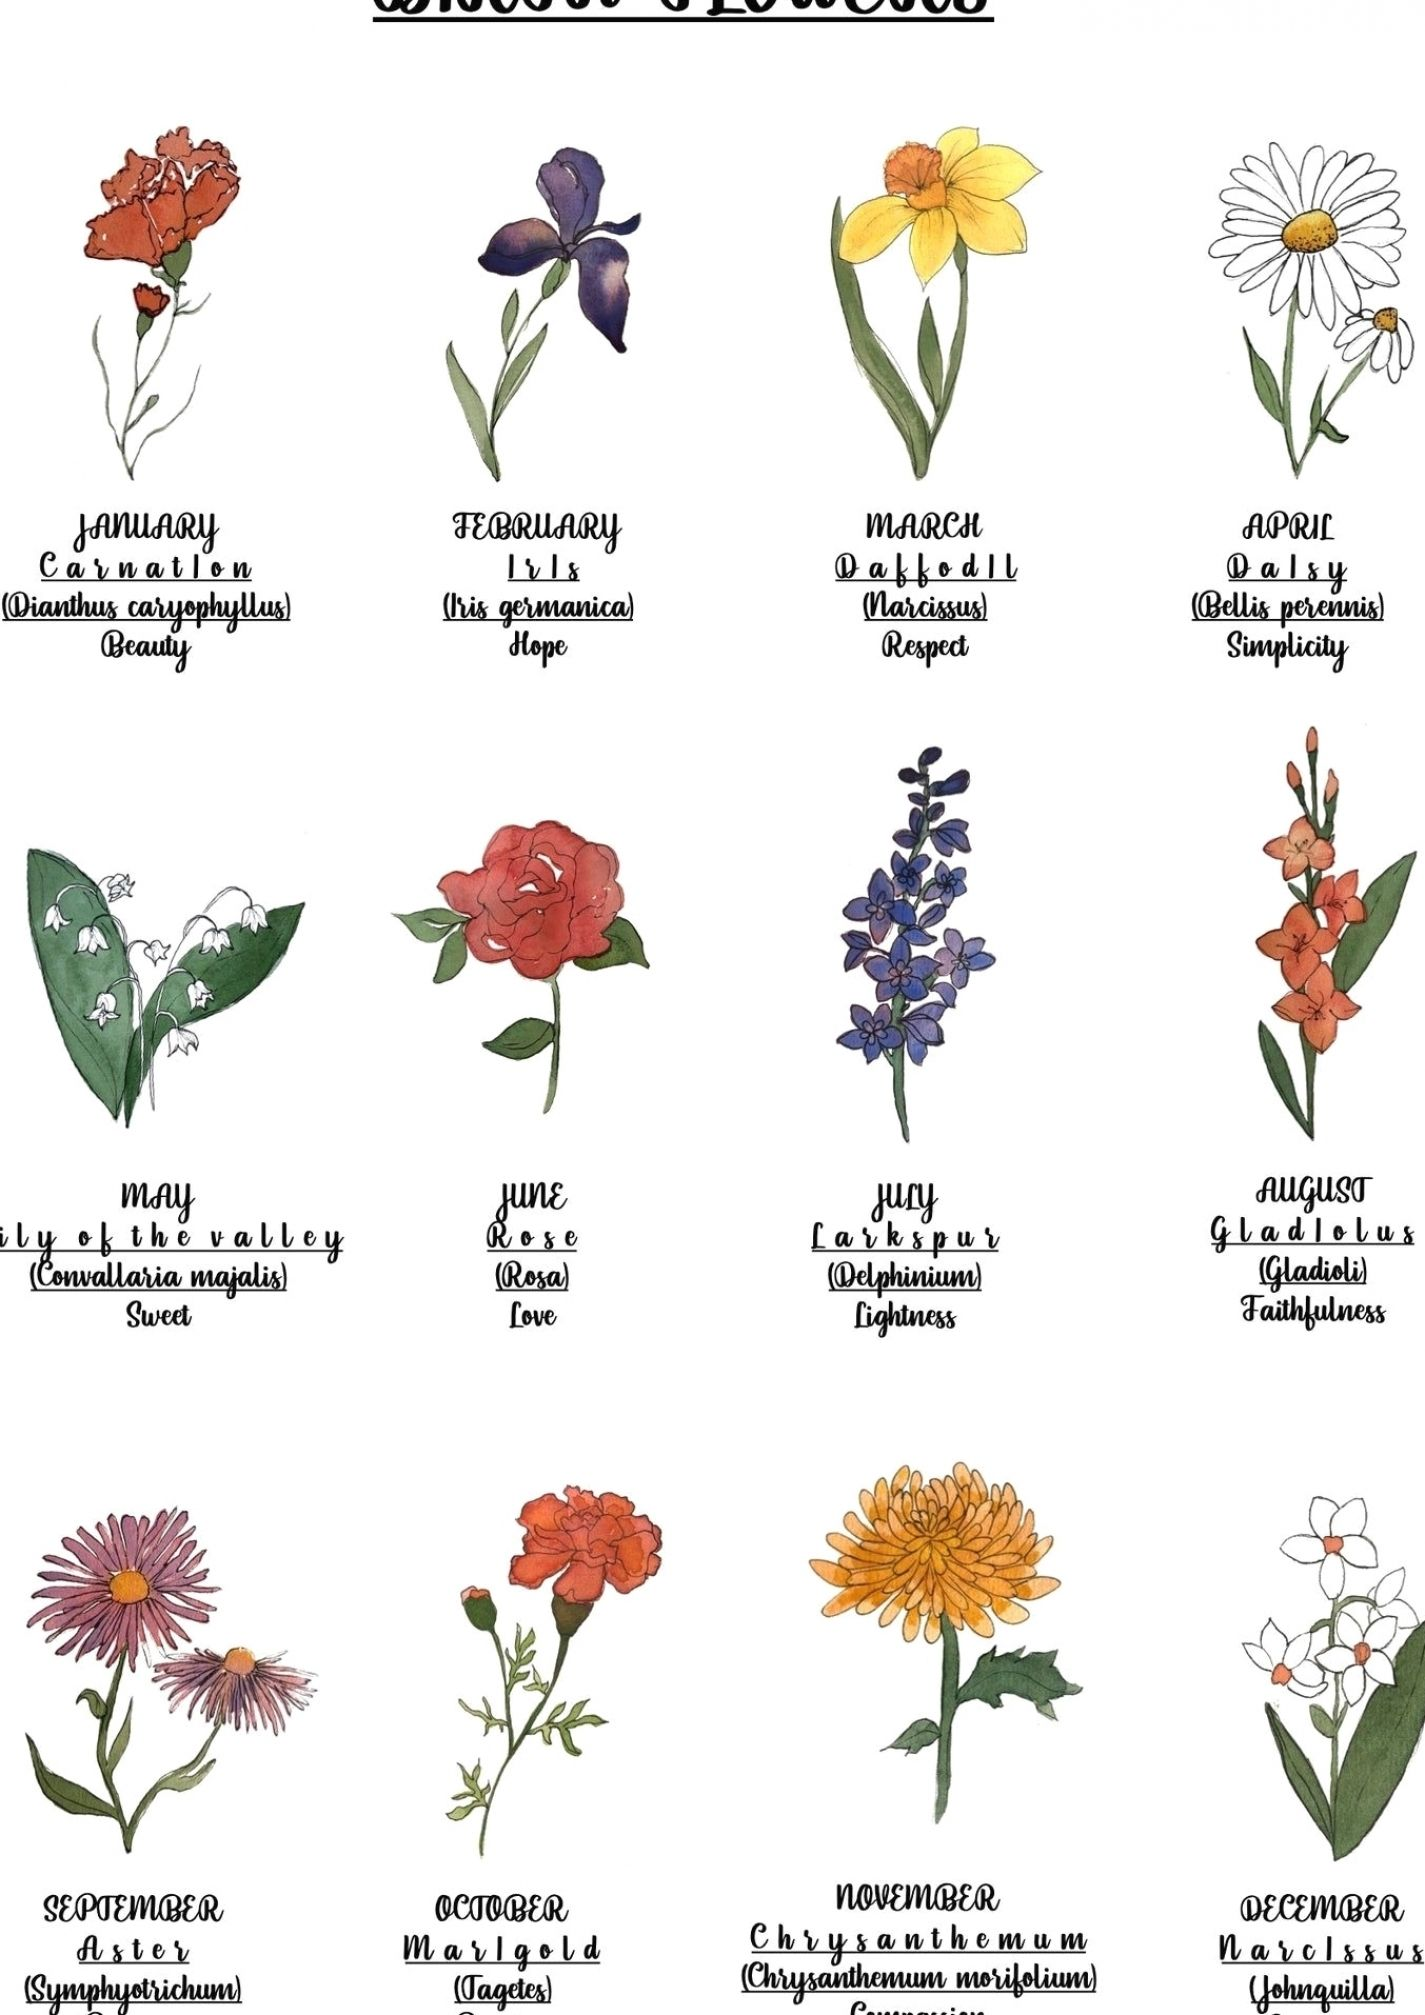 June Birth Flower Tattoo : birth, flower, tattoo, Flower, Tattoos, Tattoo, Ideas, Birth, Tattoos,, Flowers,, Flowers